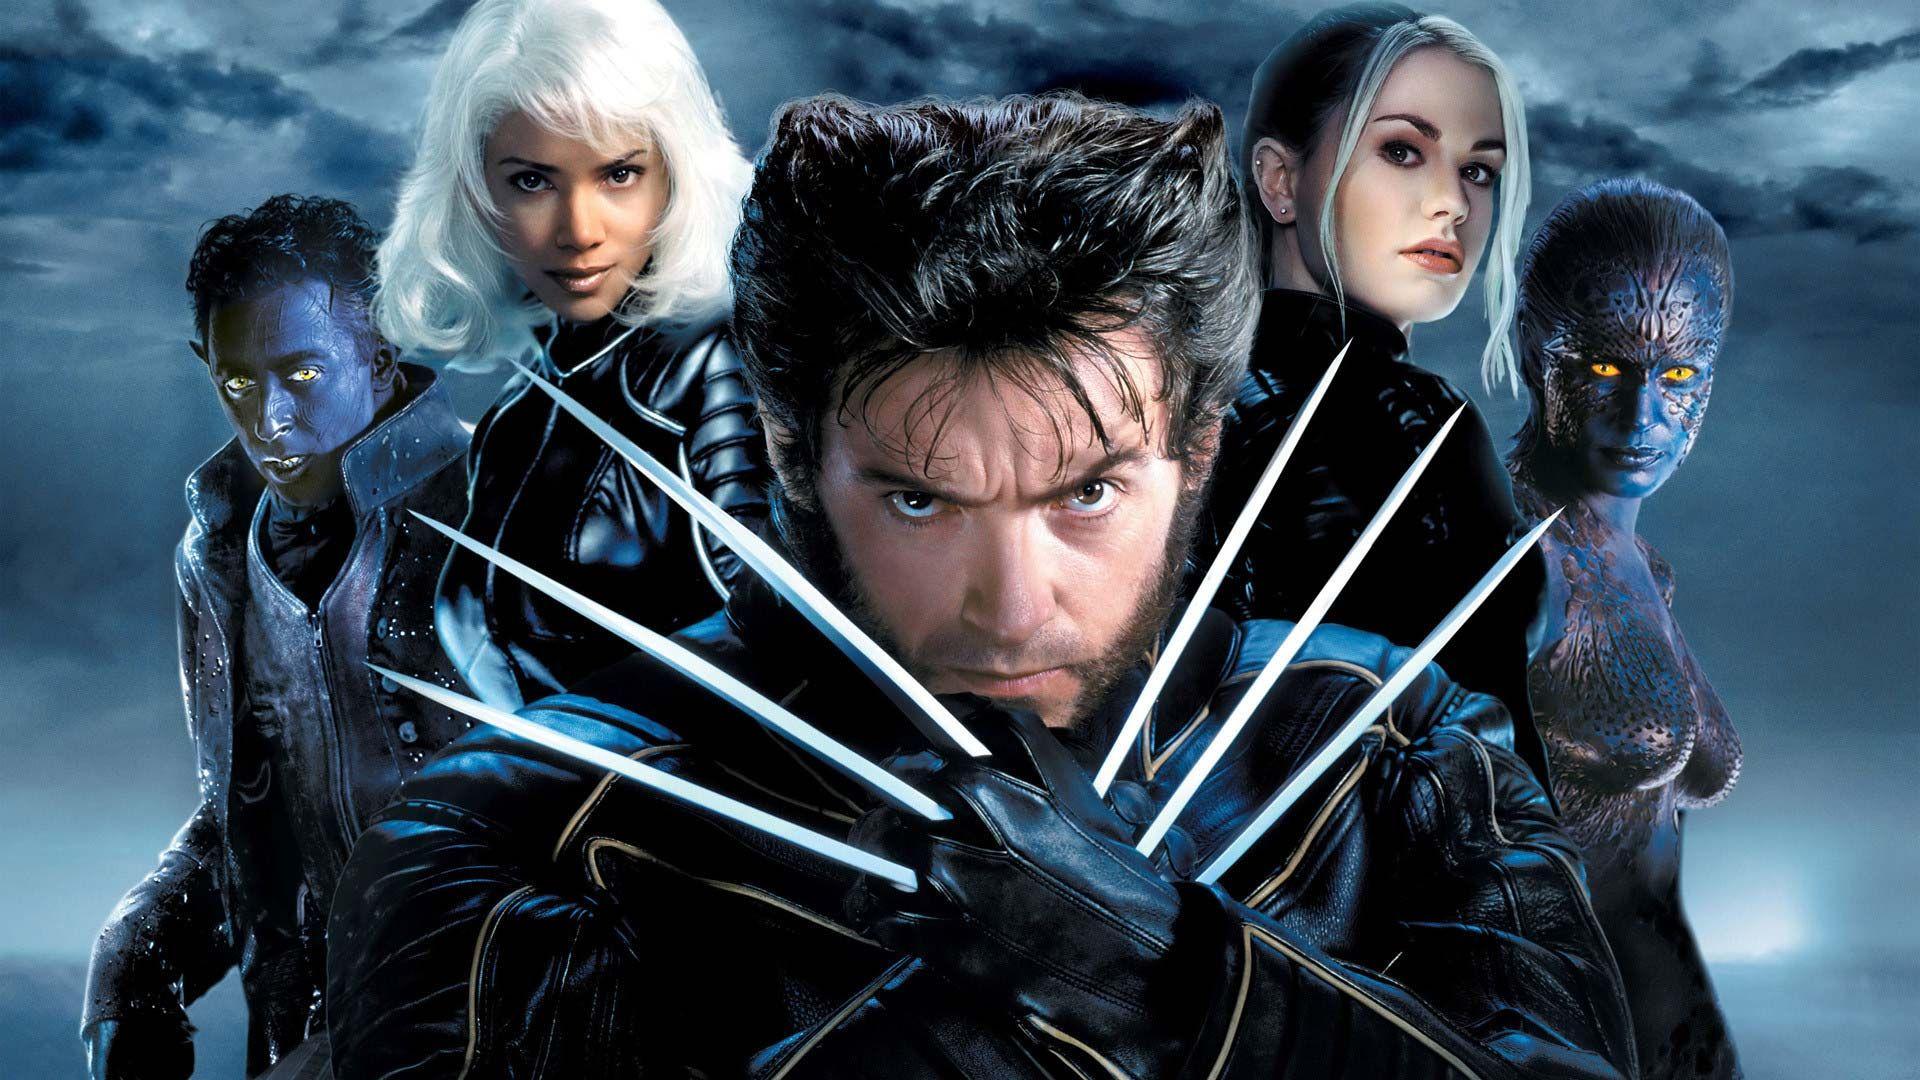 Hugh Jackman X Men Wolverine Wallpapers Hd Collection X Men X Men Evolution Wolverine Hugh Jackman